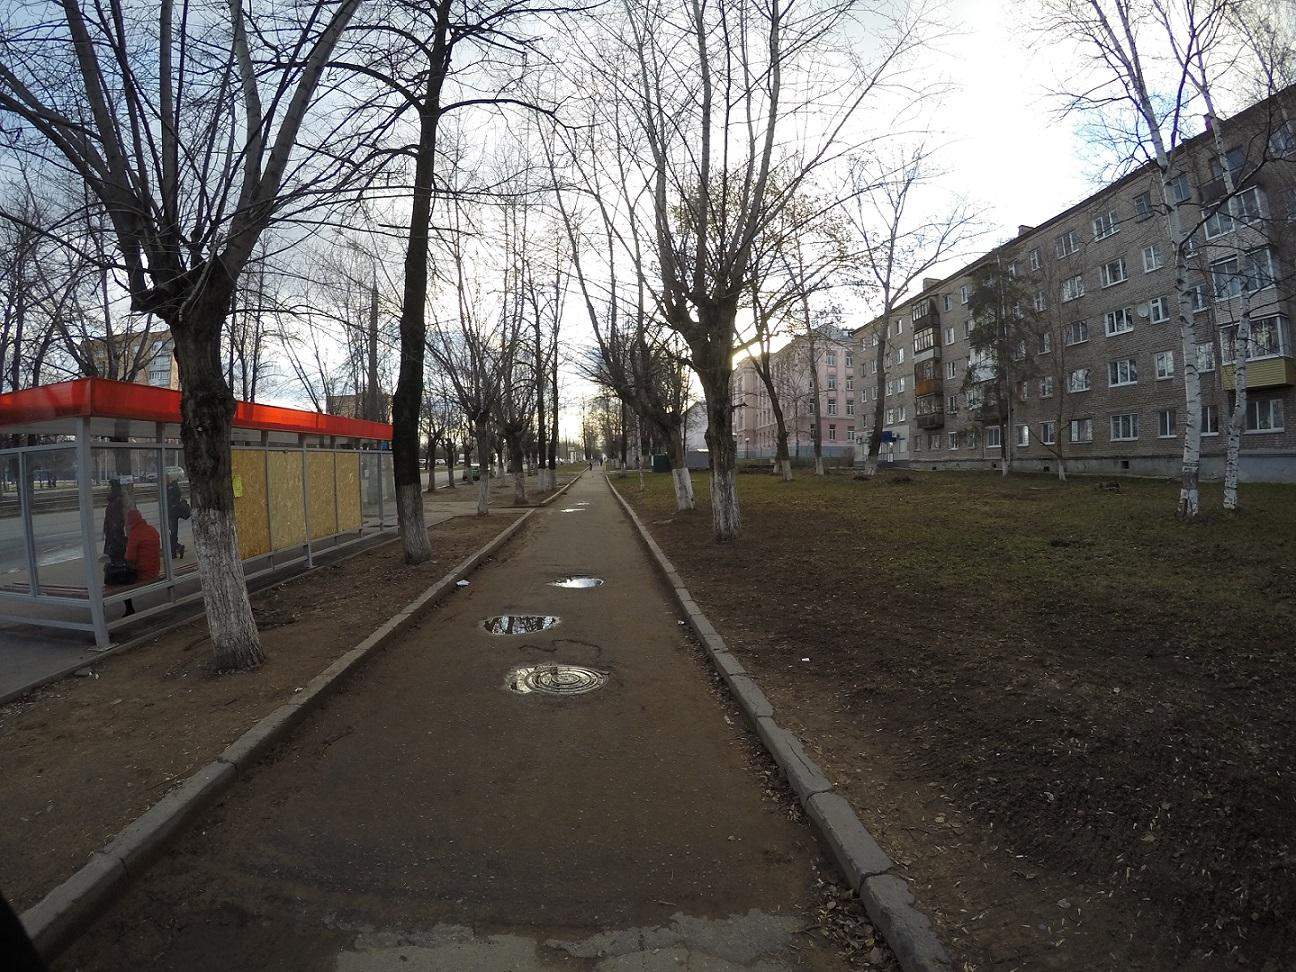 http://img-fotki.yandex.ru/get/214545/471667021.0/0_1c9b26_e69d155d_orig.jpg